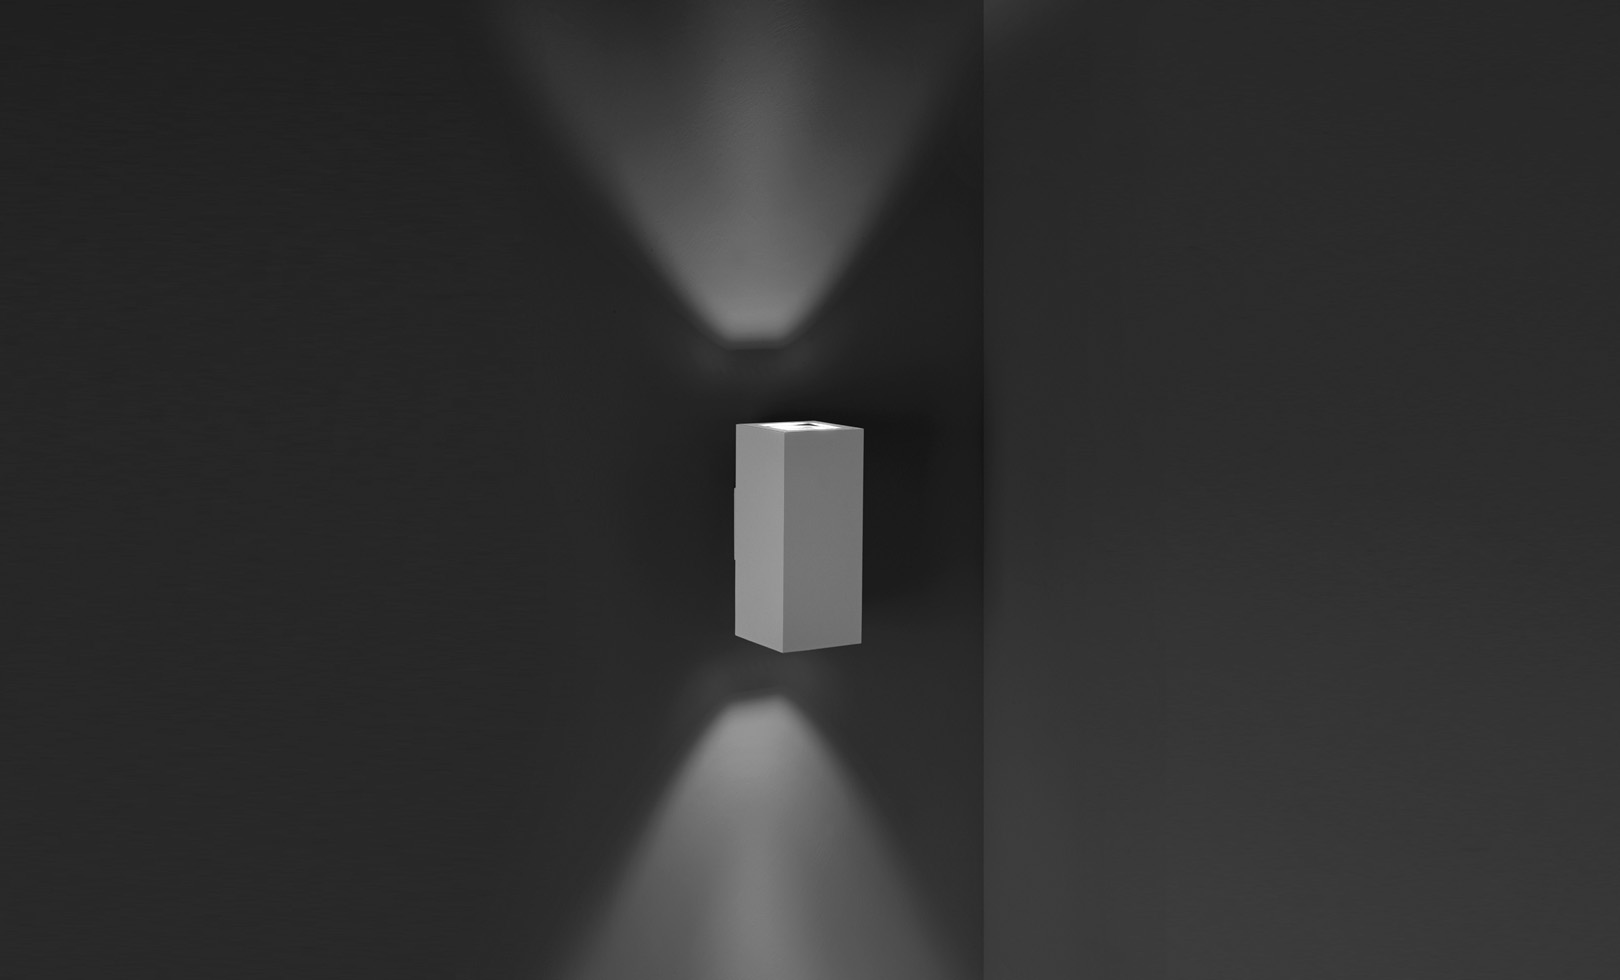 401011 TECH MAXI 02 SQUARE LED 2x39W 1